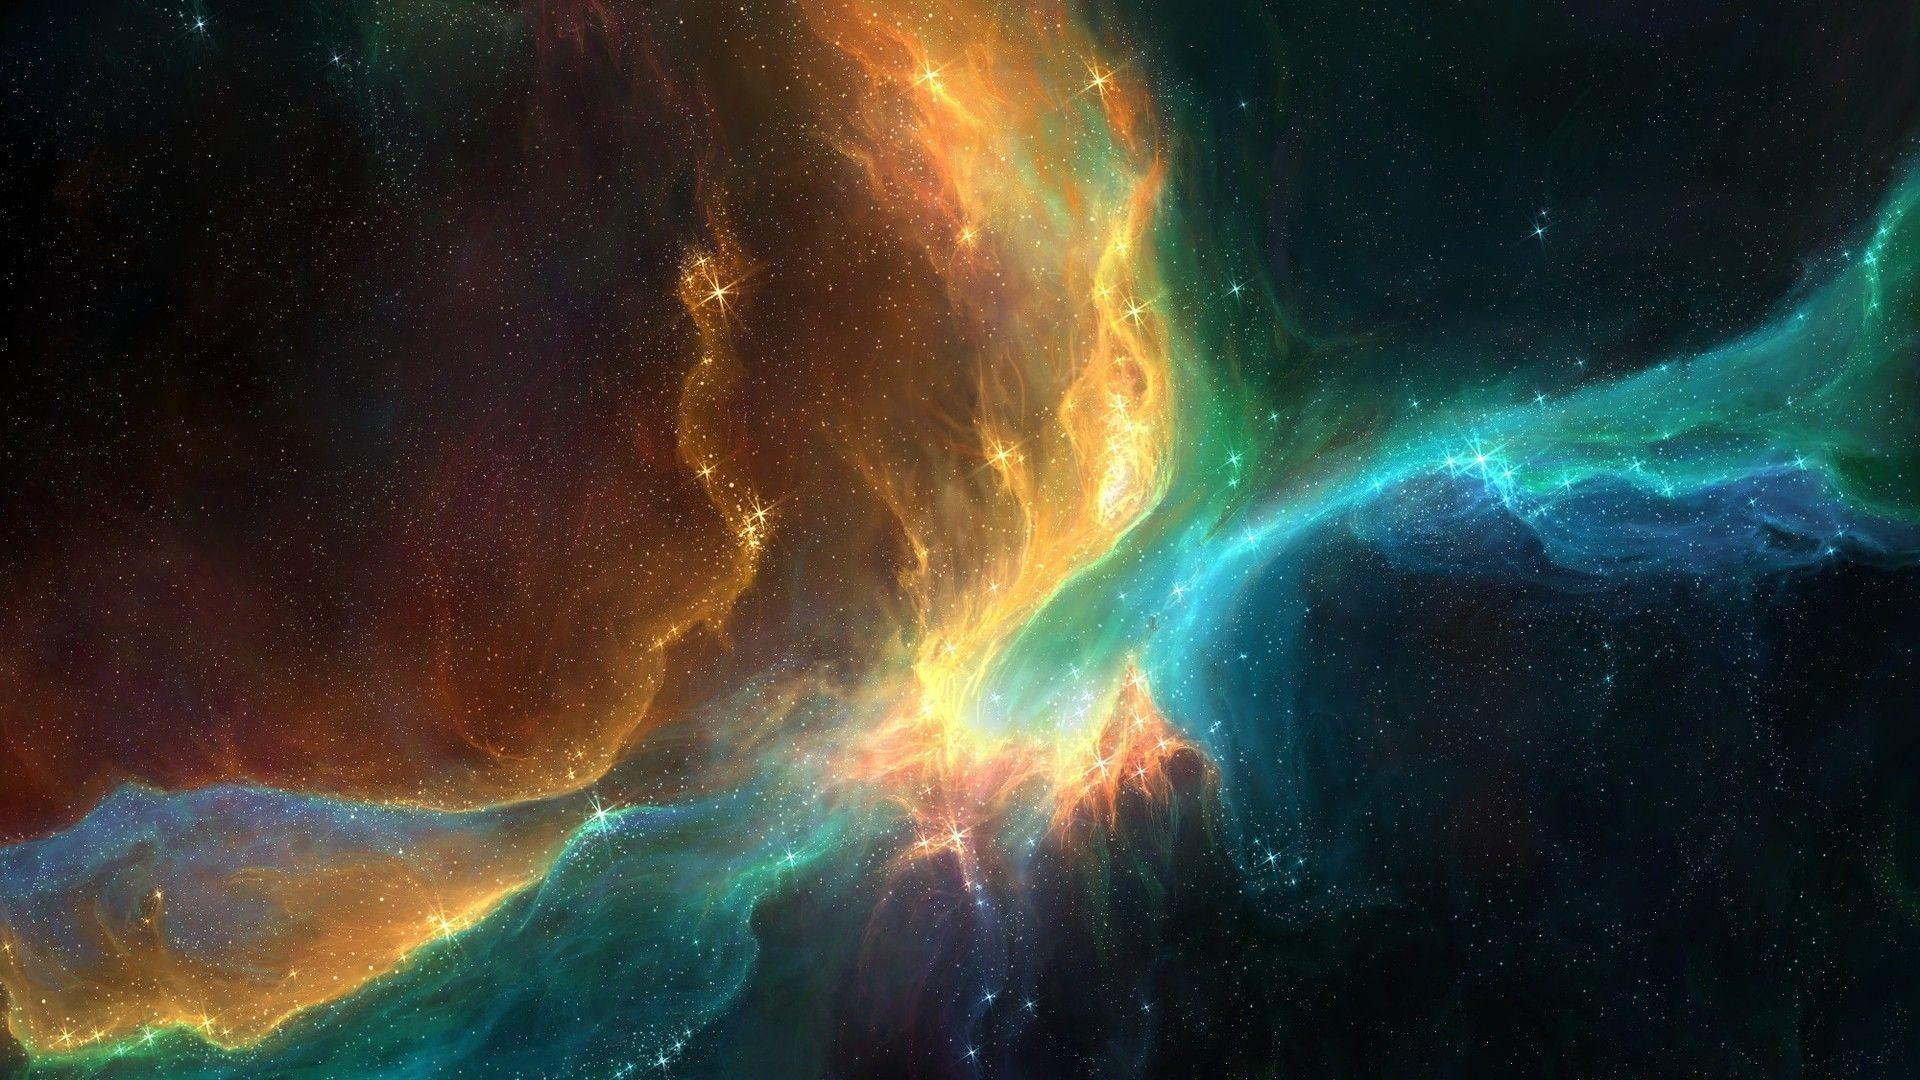 eagle nebula wallpaper widescreen - photo #11